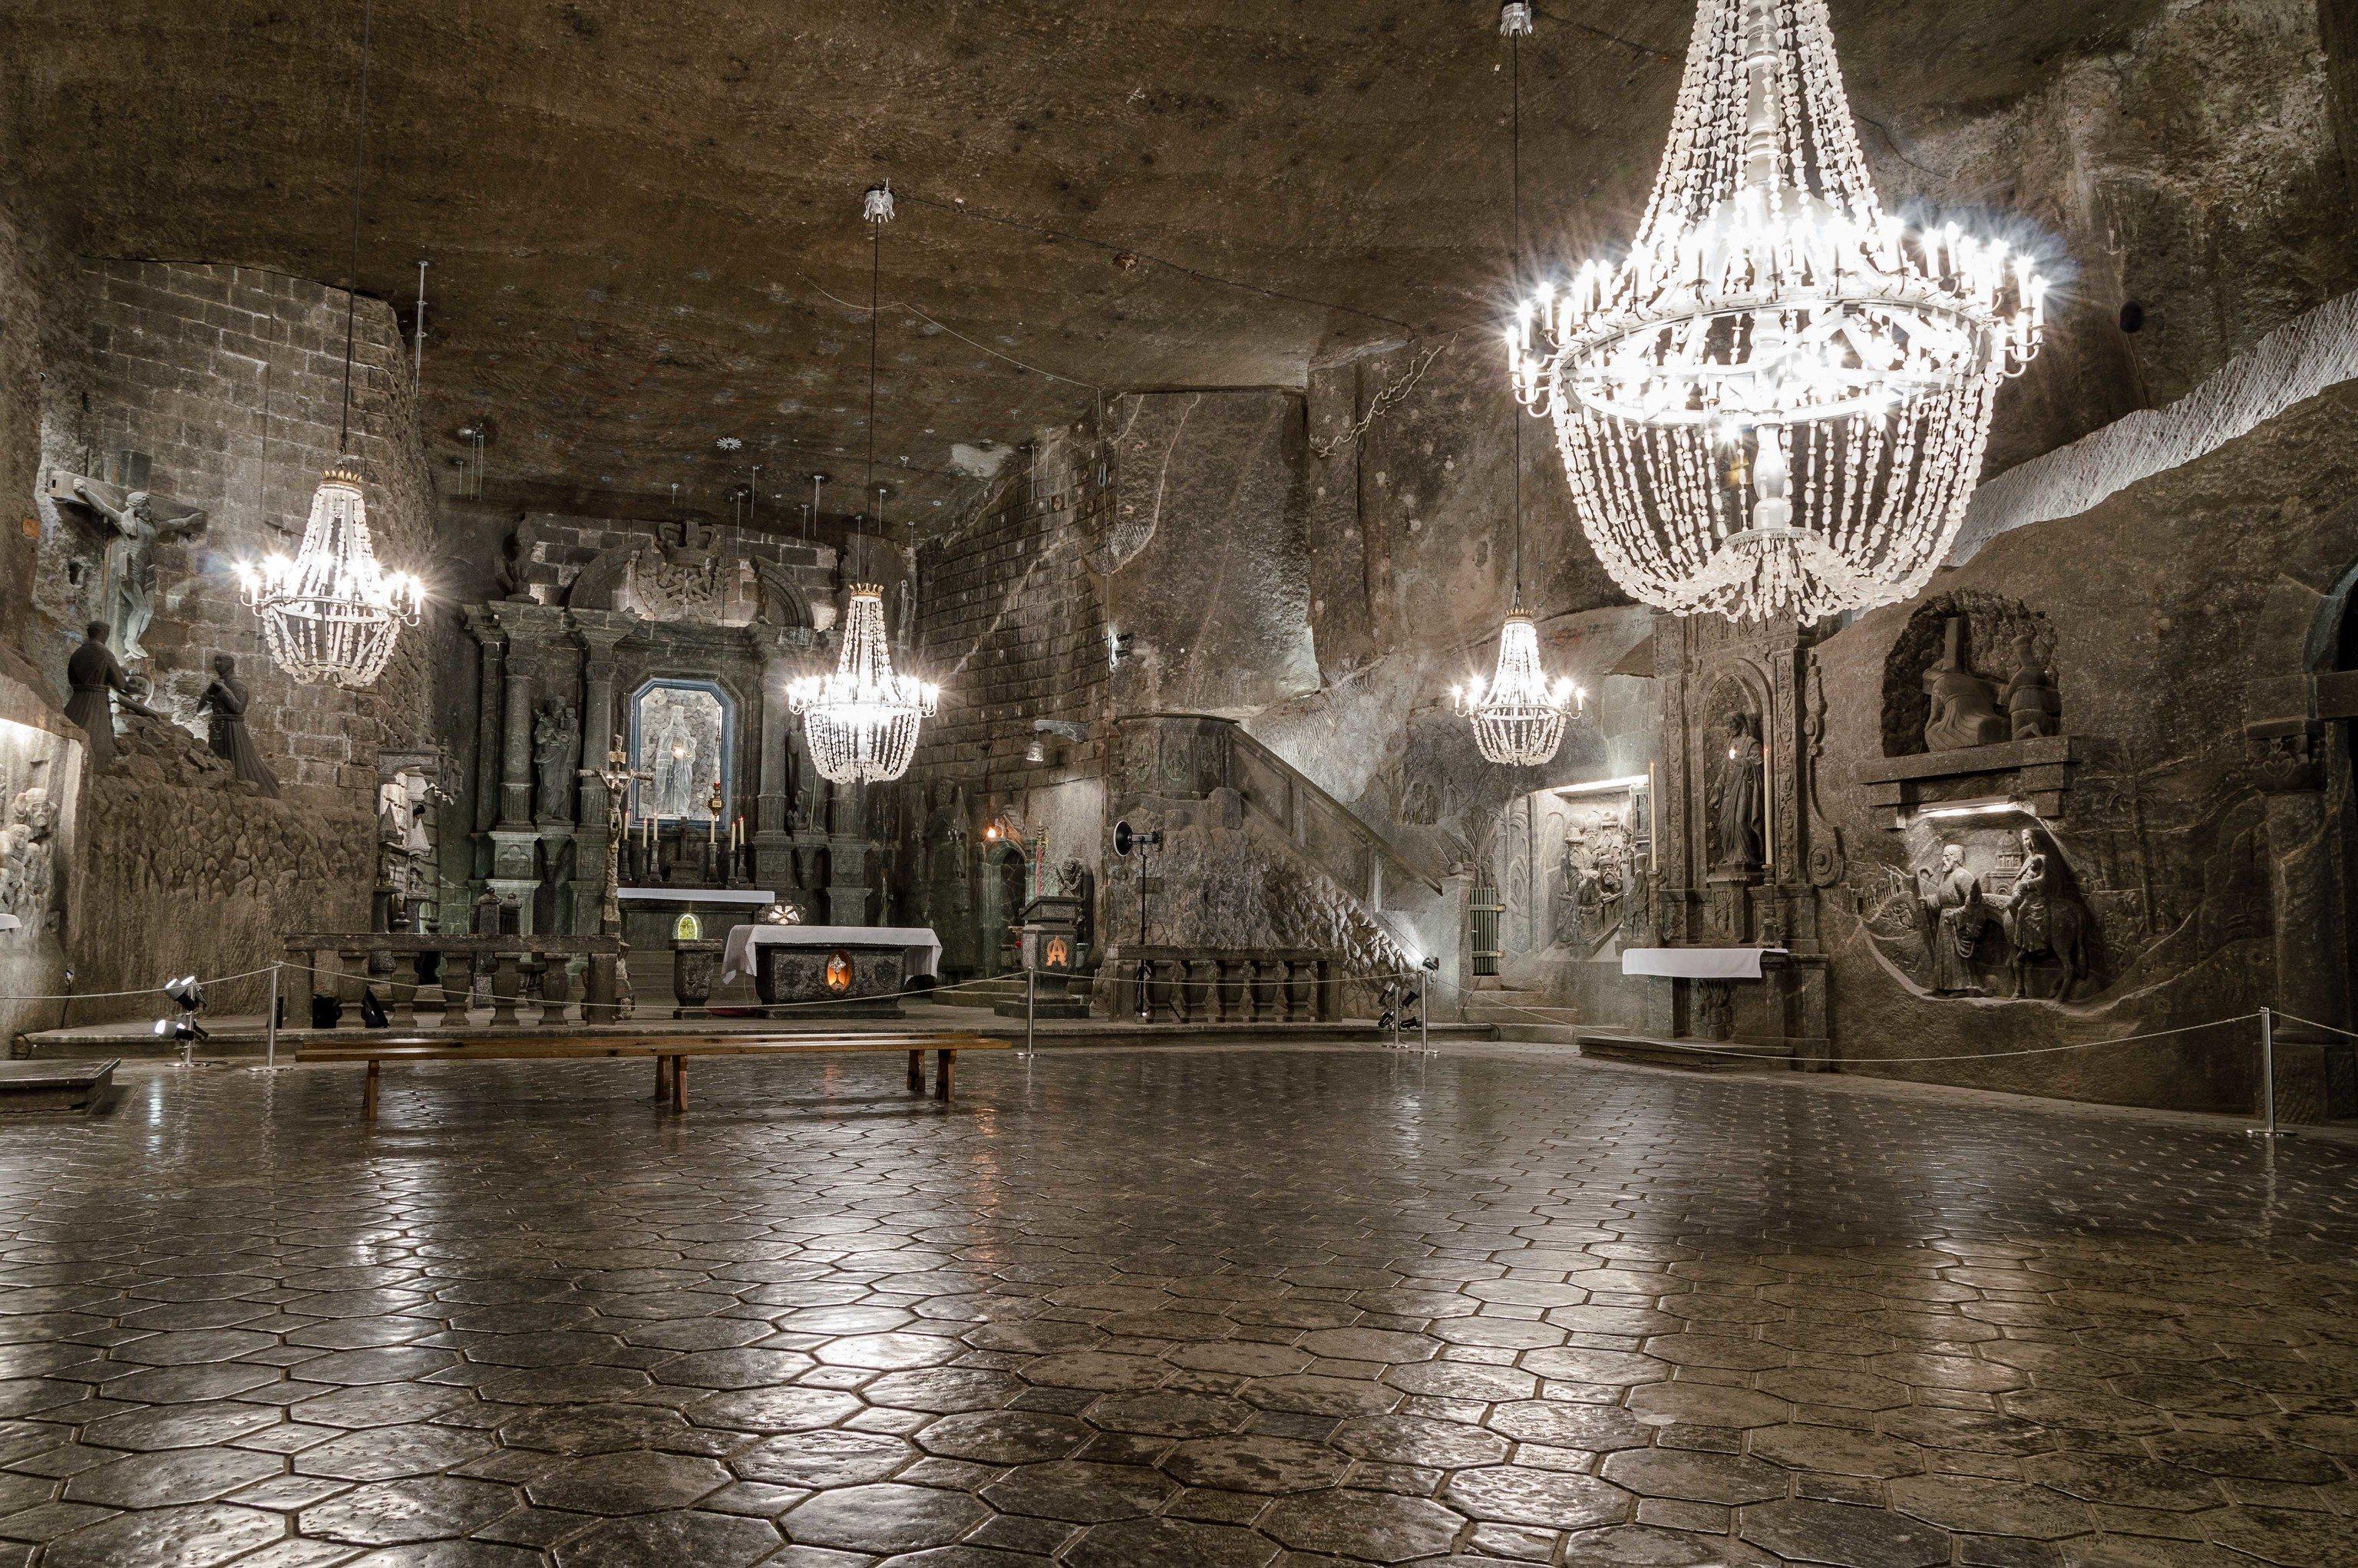 Croatia Eastern Europe europe Montenegro Slovenia Trip Ideas tourist attraction building night history